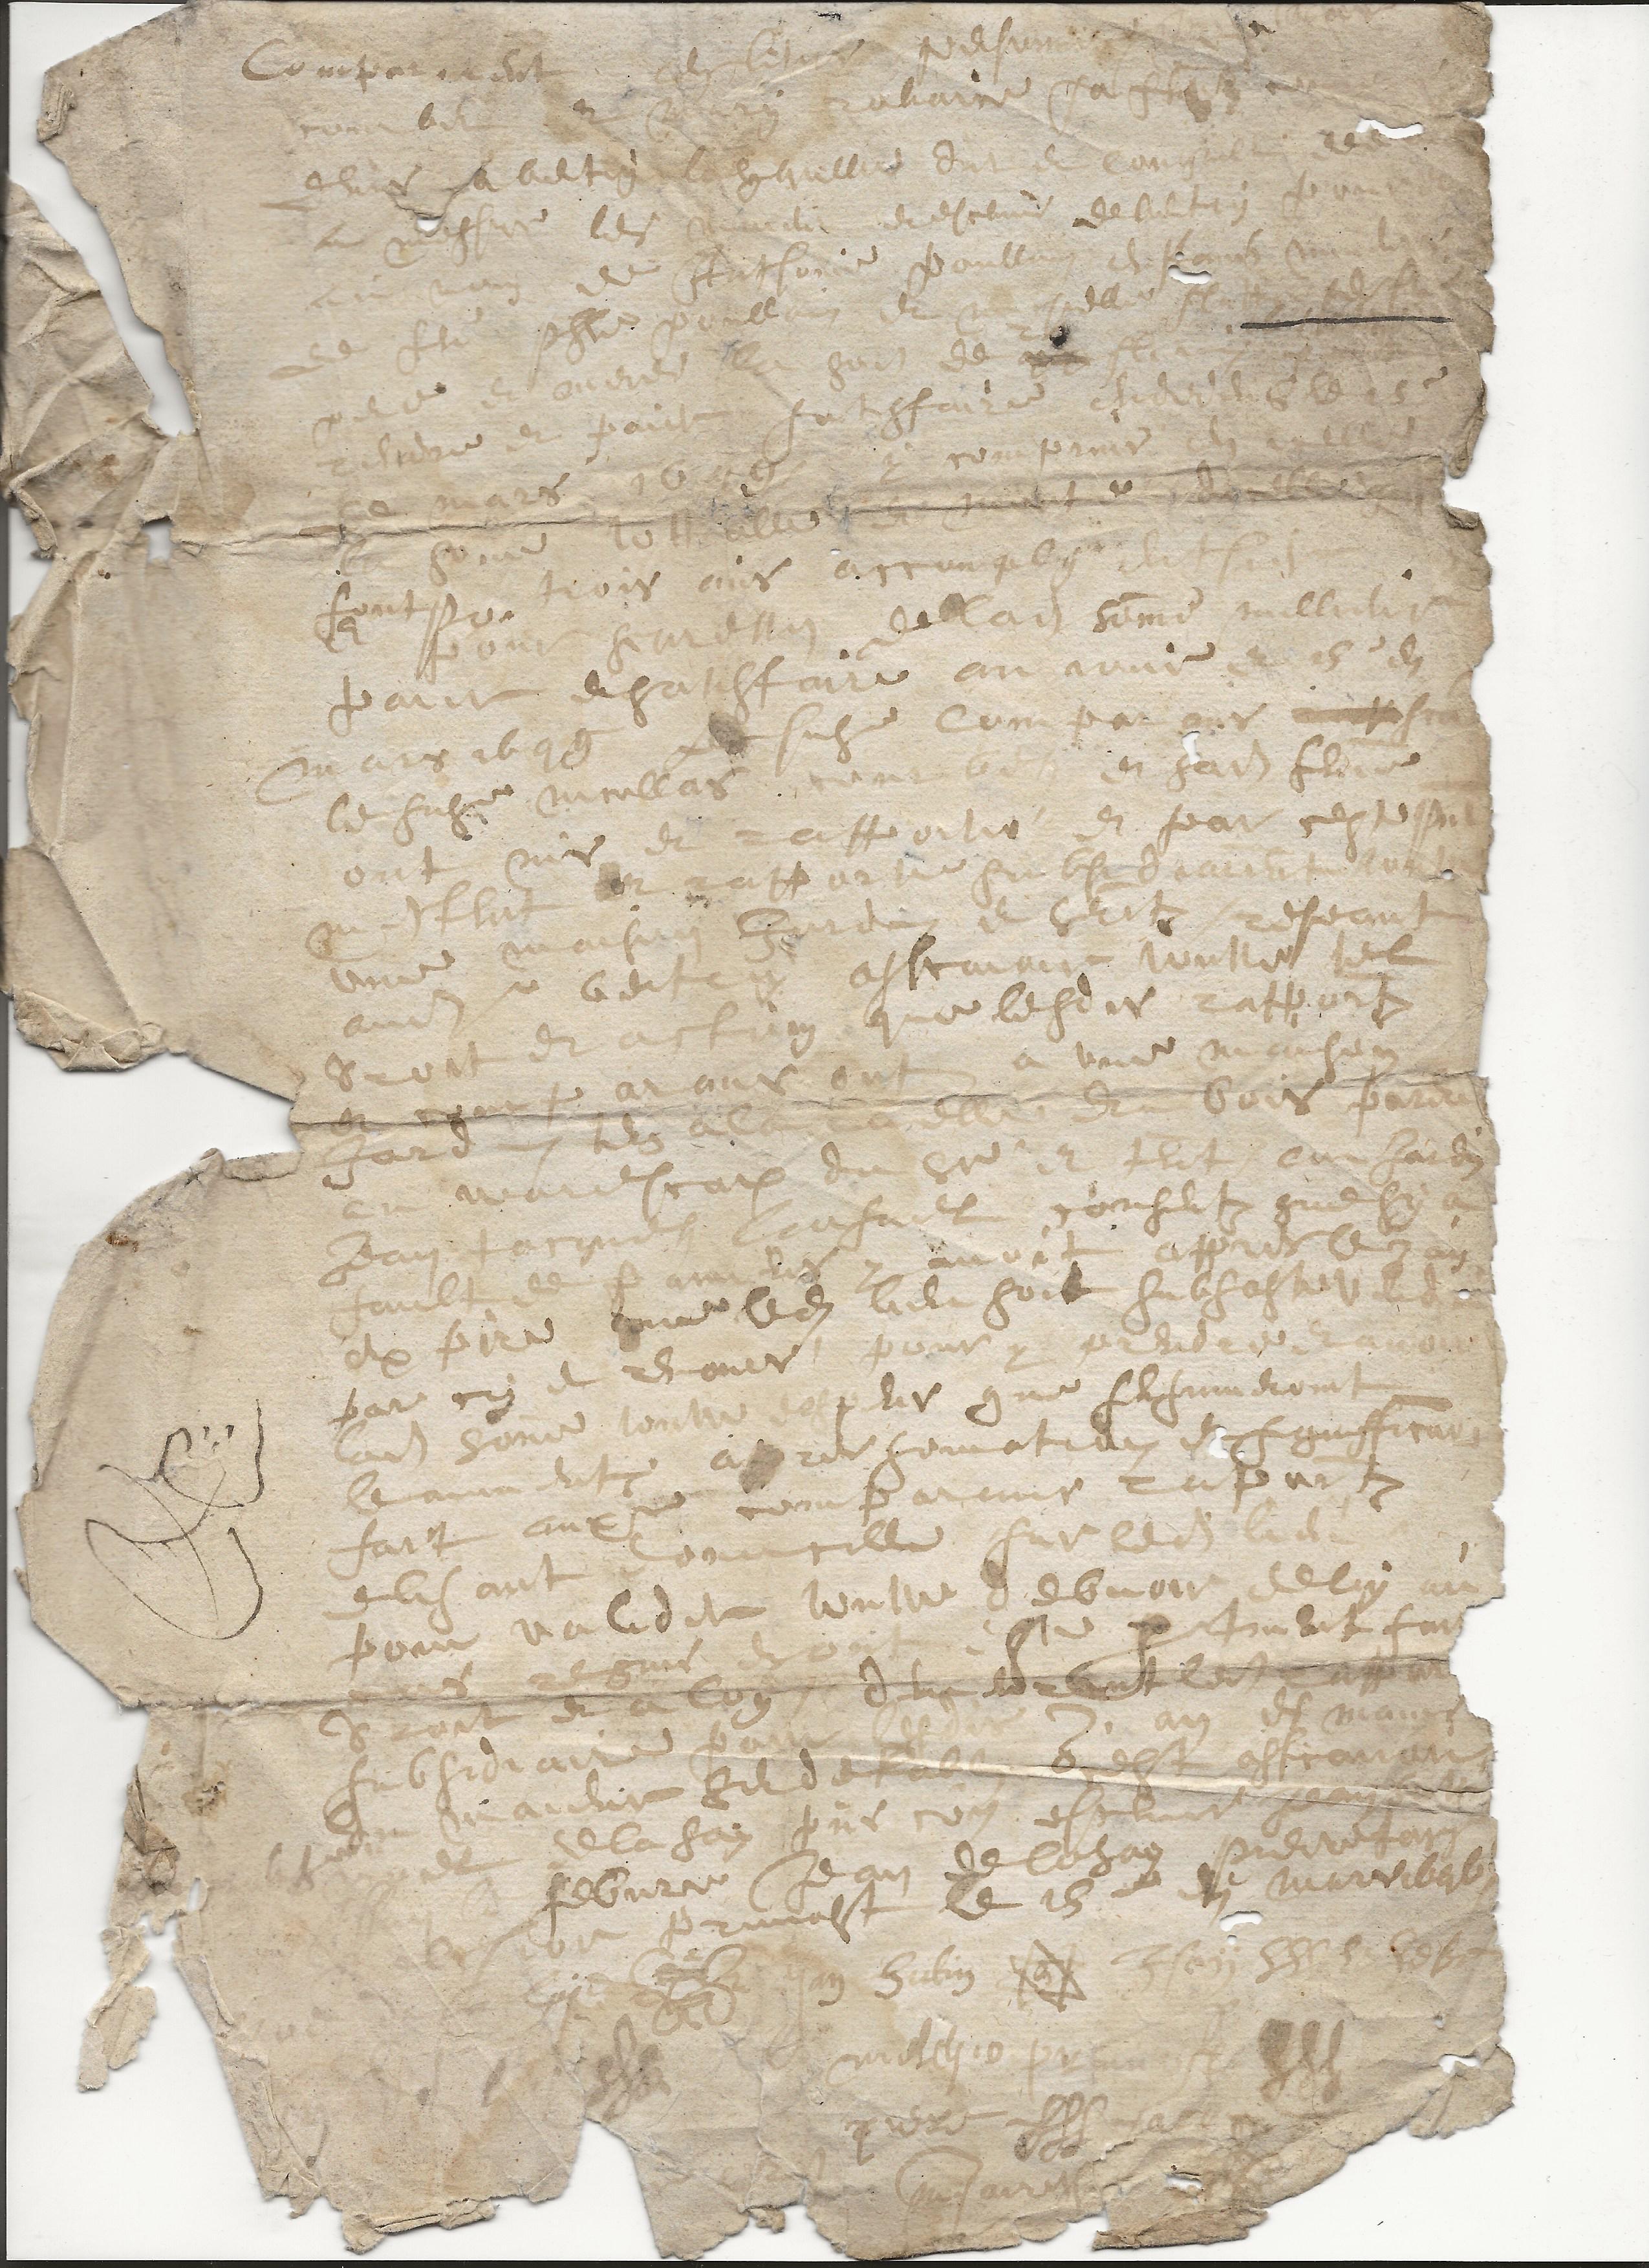 1649 partage terres anthoine philippe poullain